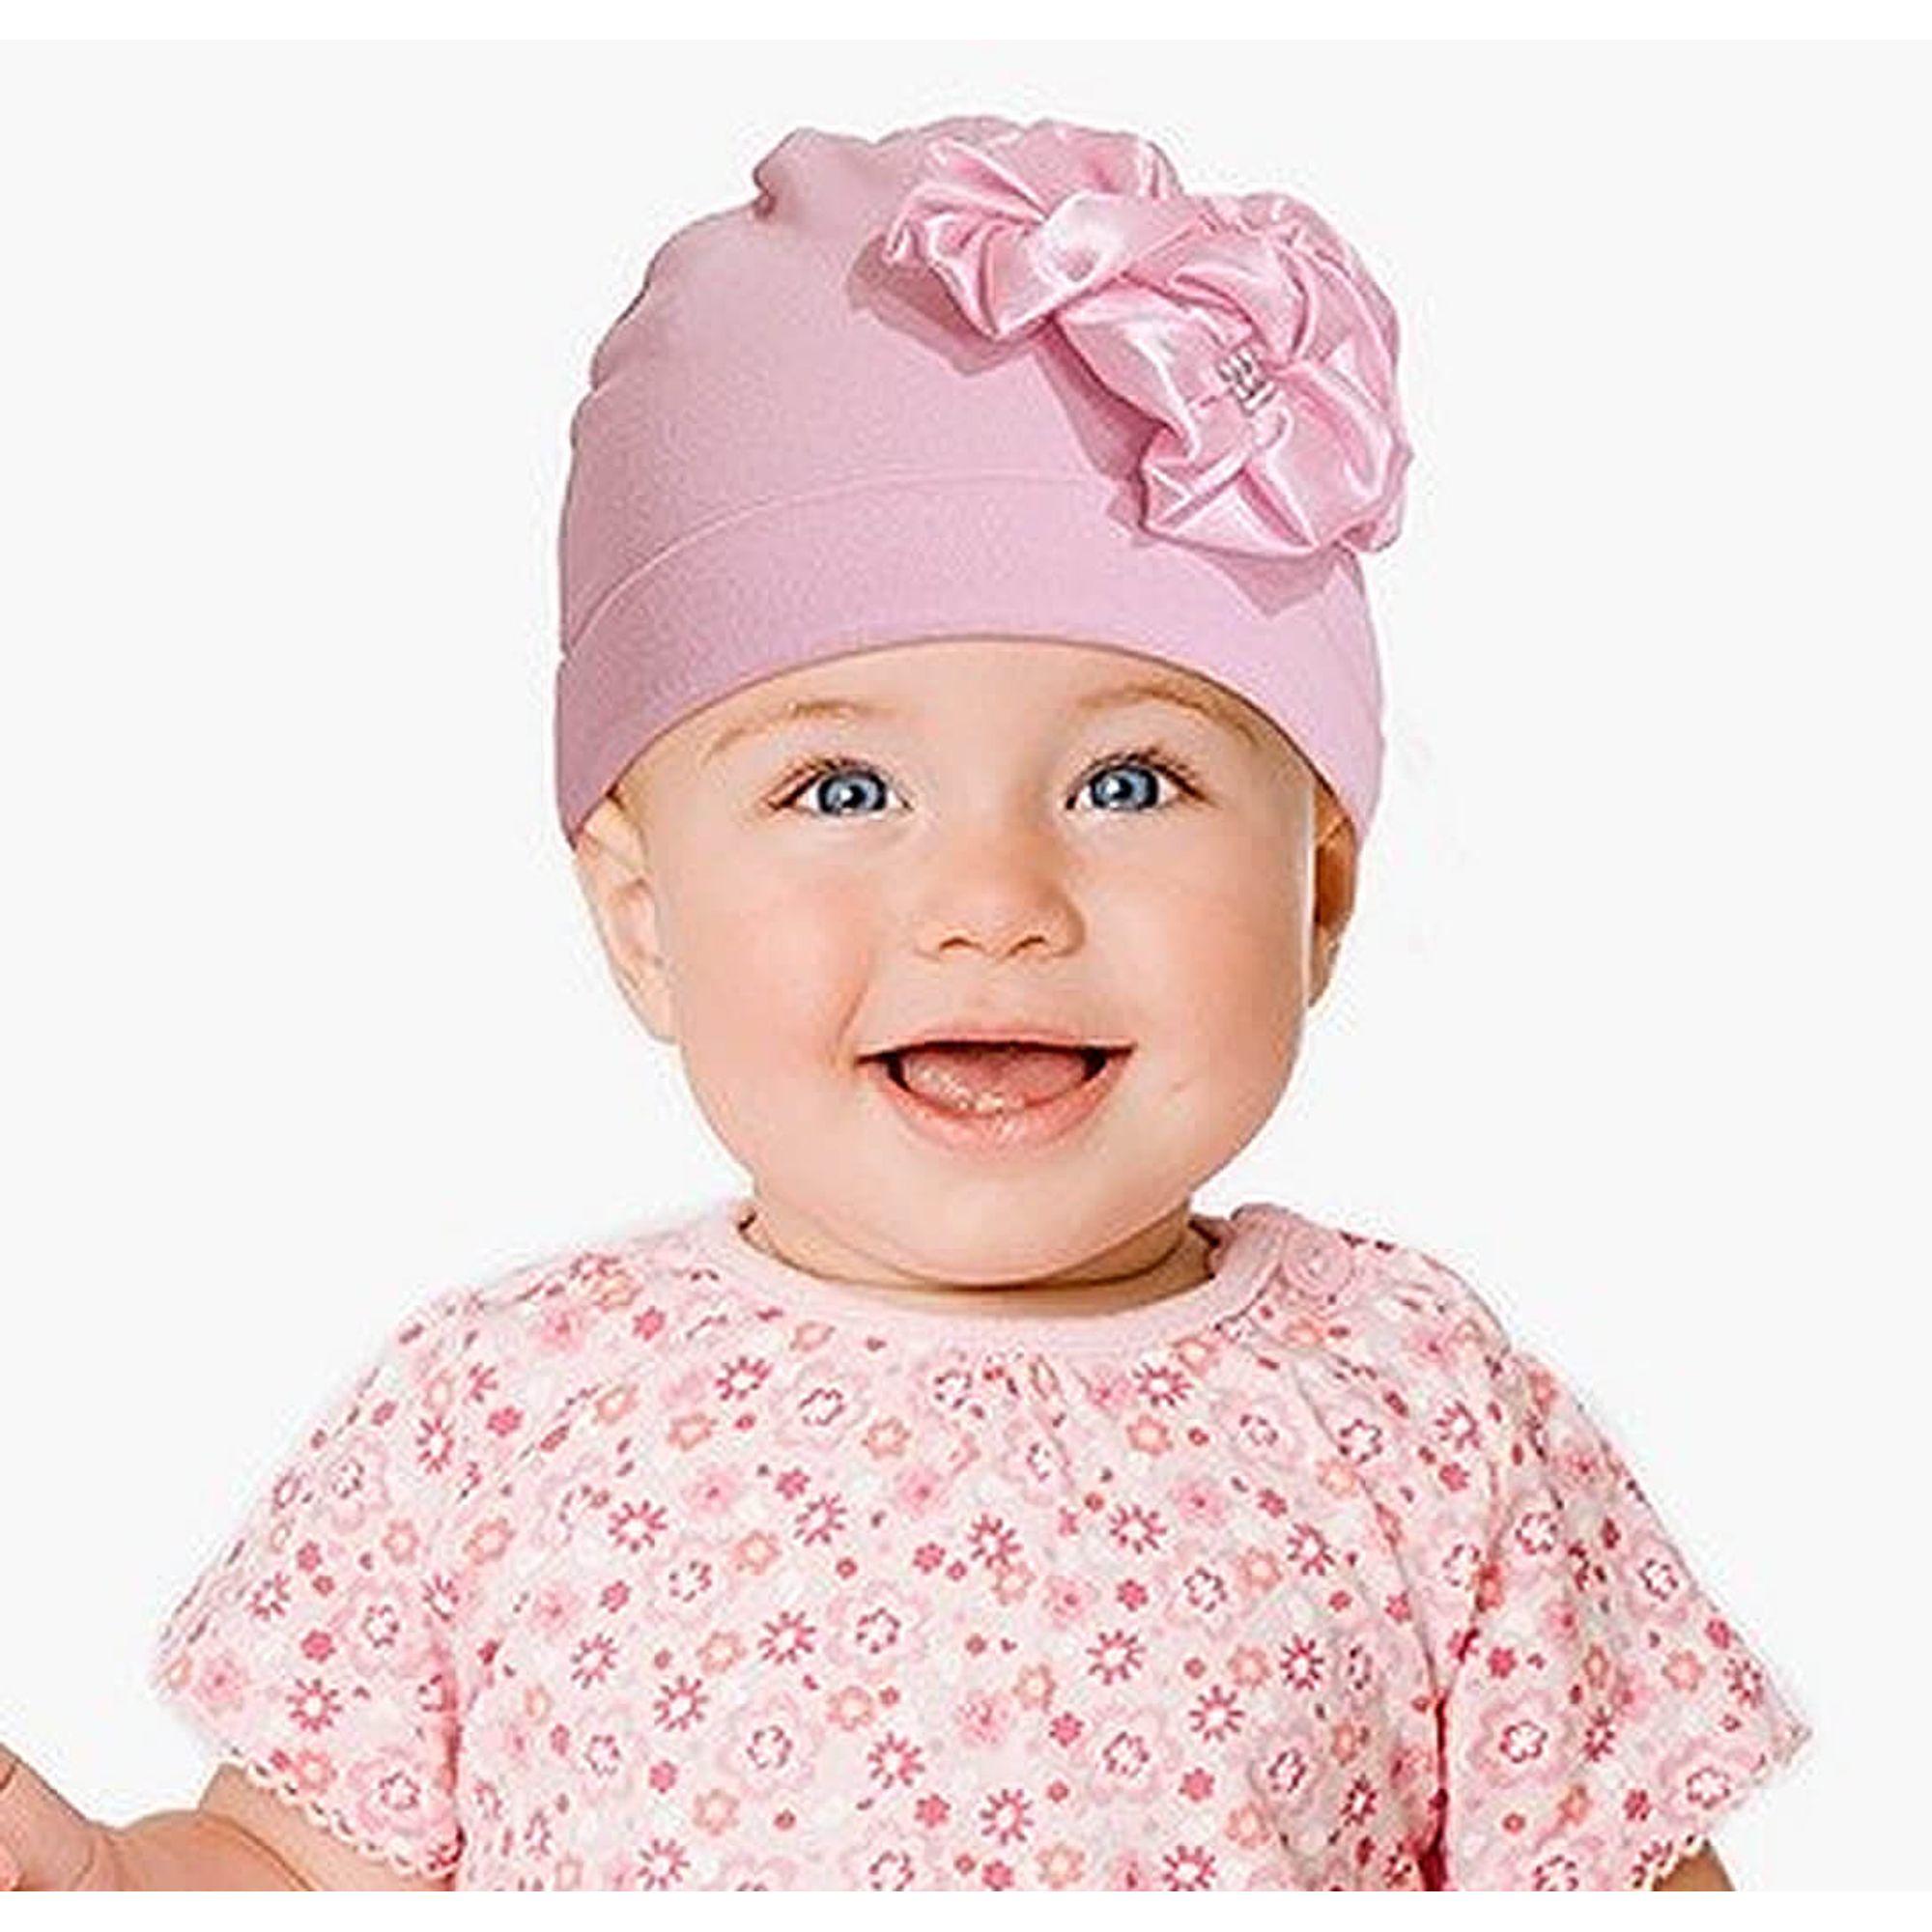 touca-bebe-rosa-com-aplique-flores-ziptoys